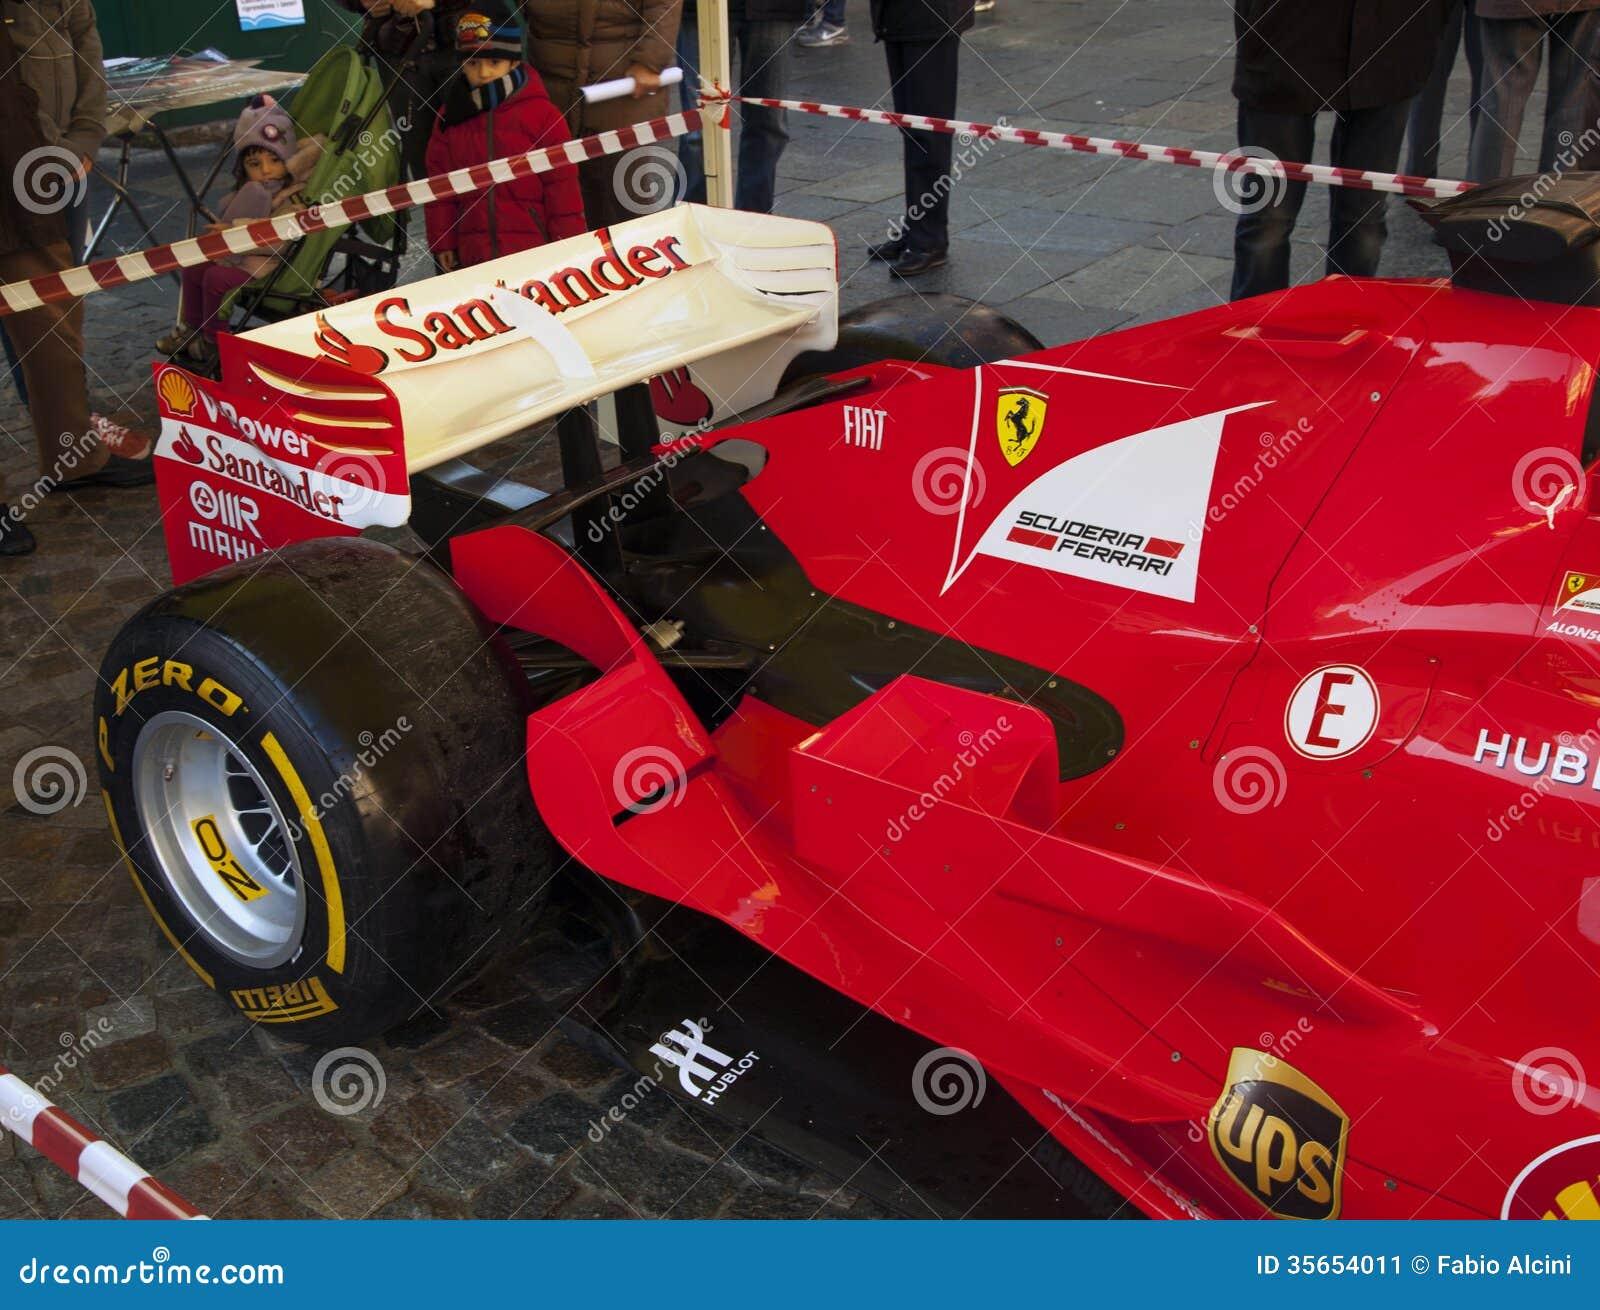 Ferrari editorial photo image 35654011 for Ferrari christmas